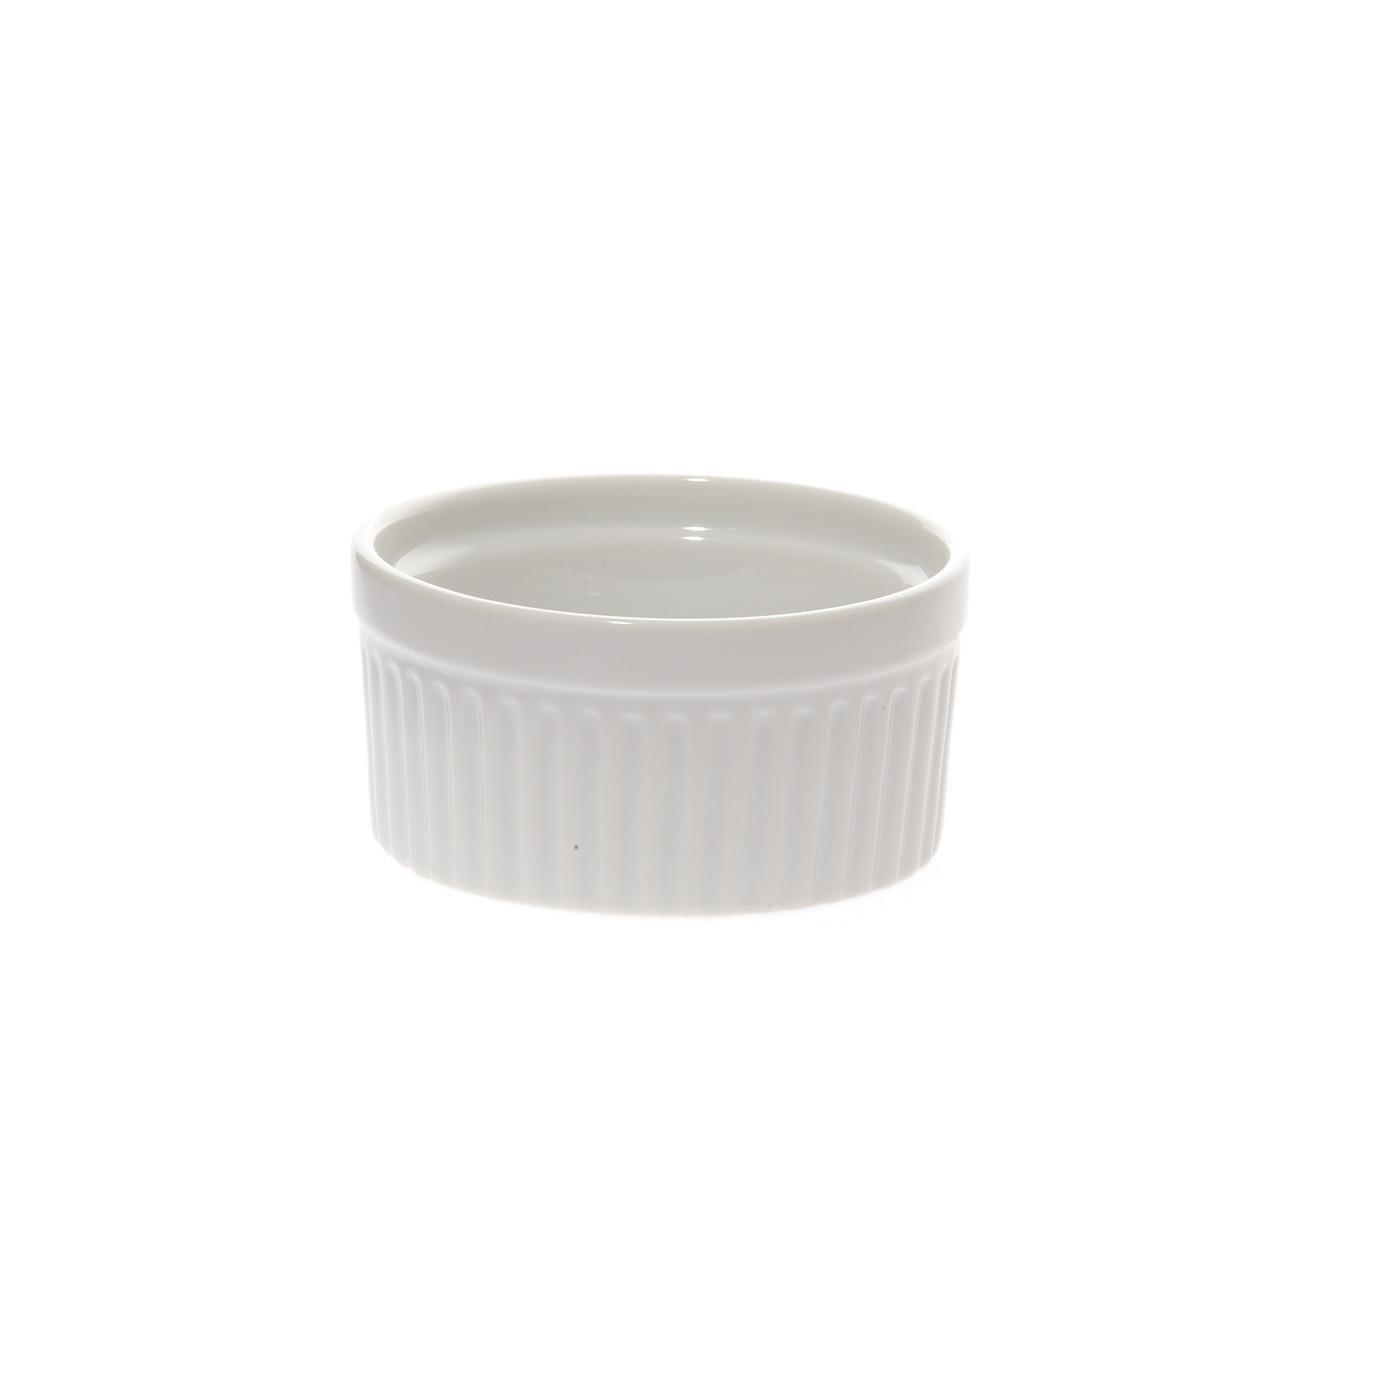 White Ceramic Ramekin